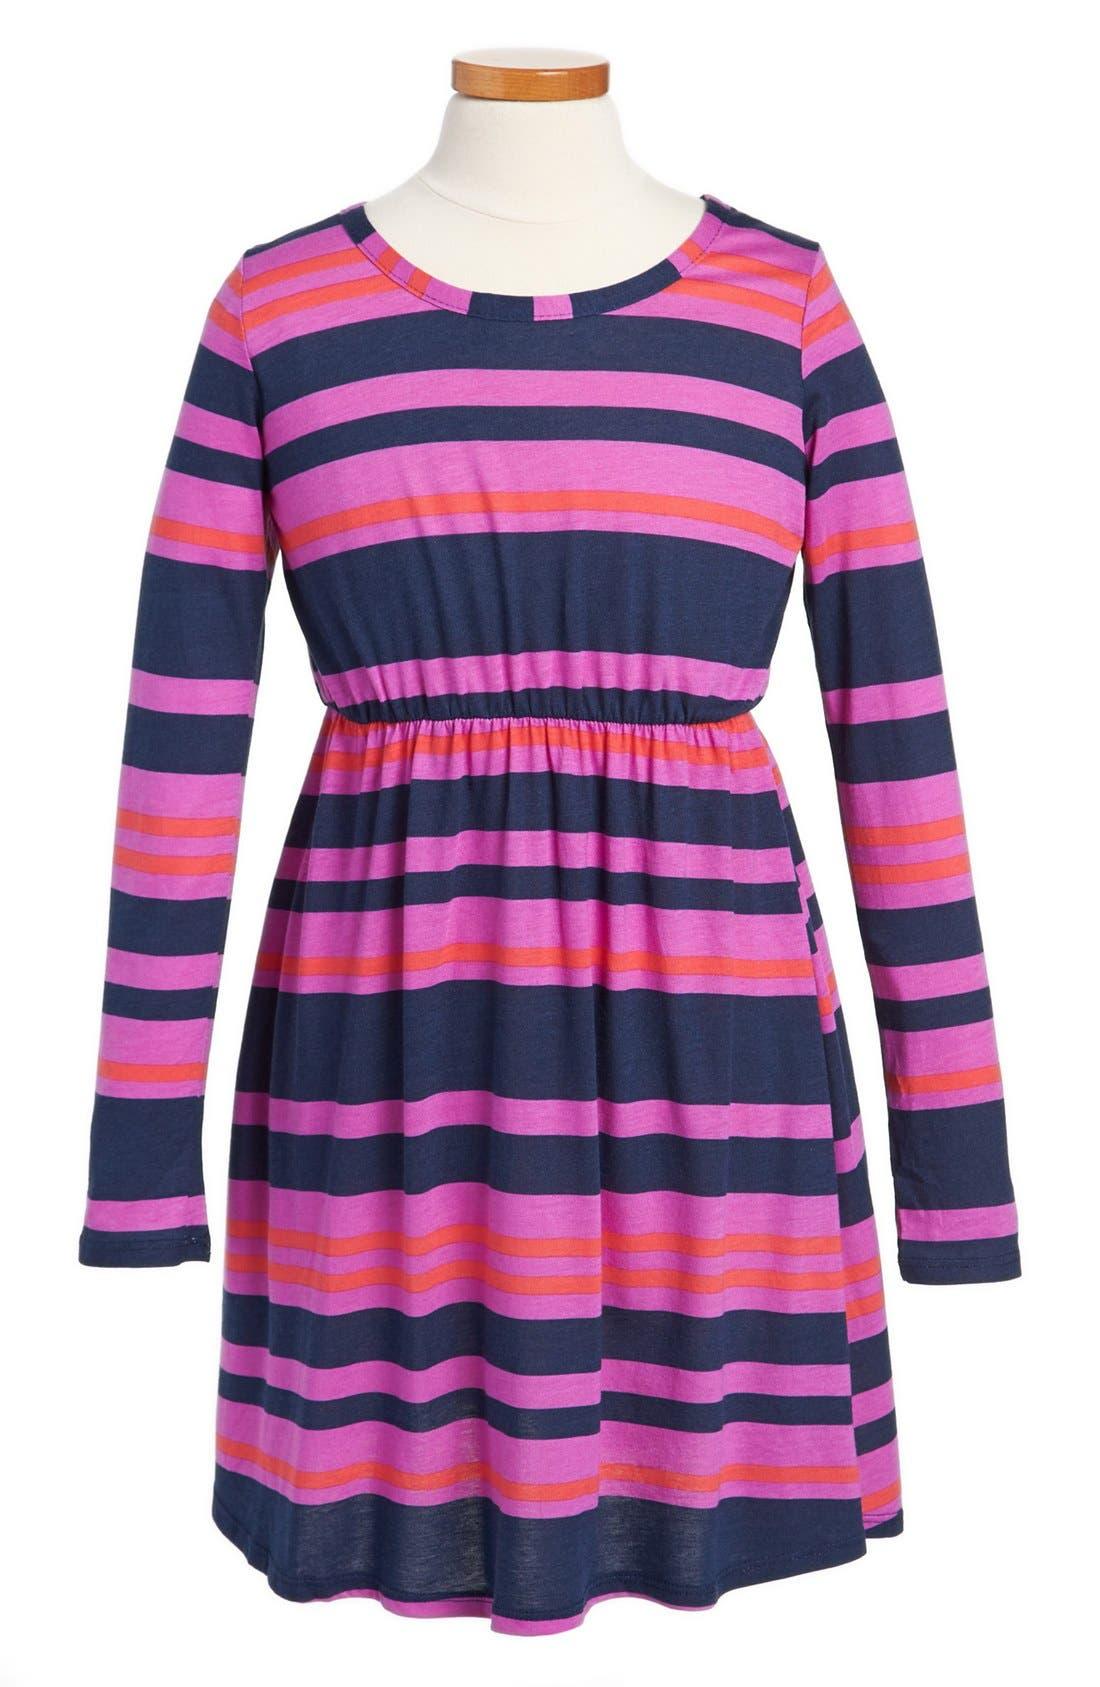 Alternate Image 1 Selected - Splendid Striped Dress (Big Girls)